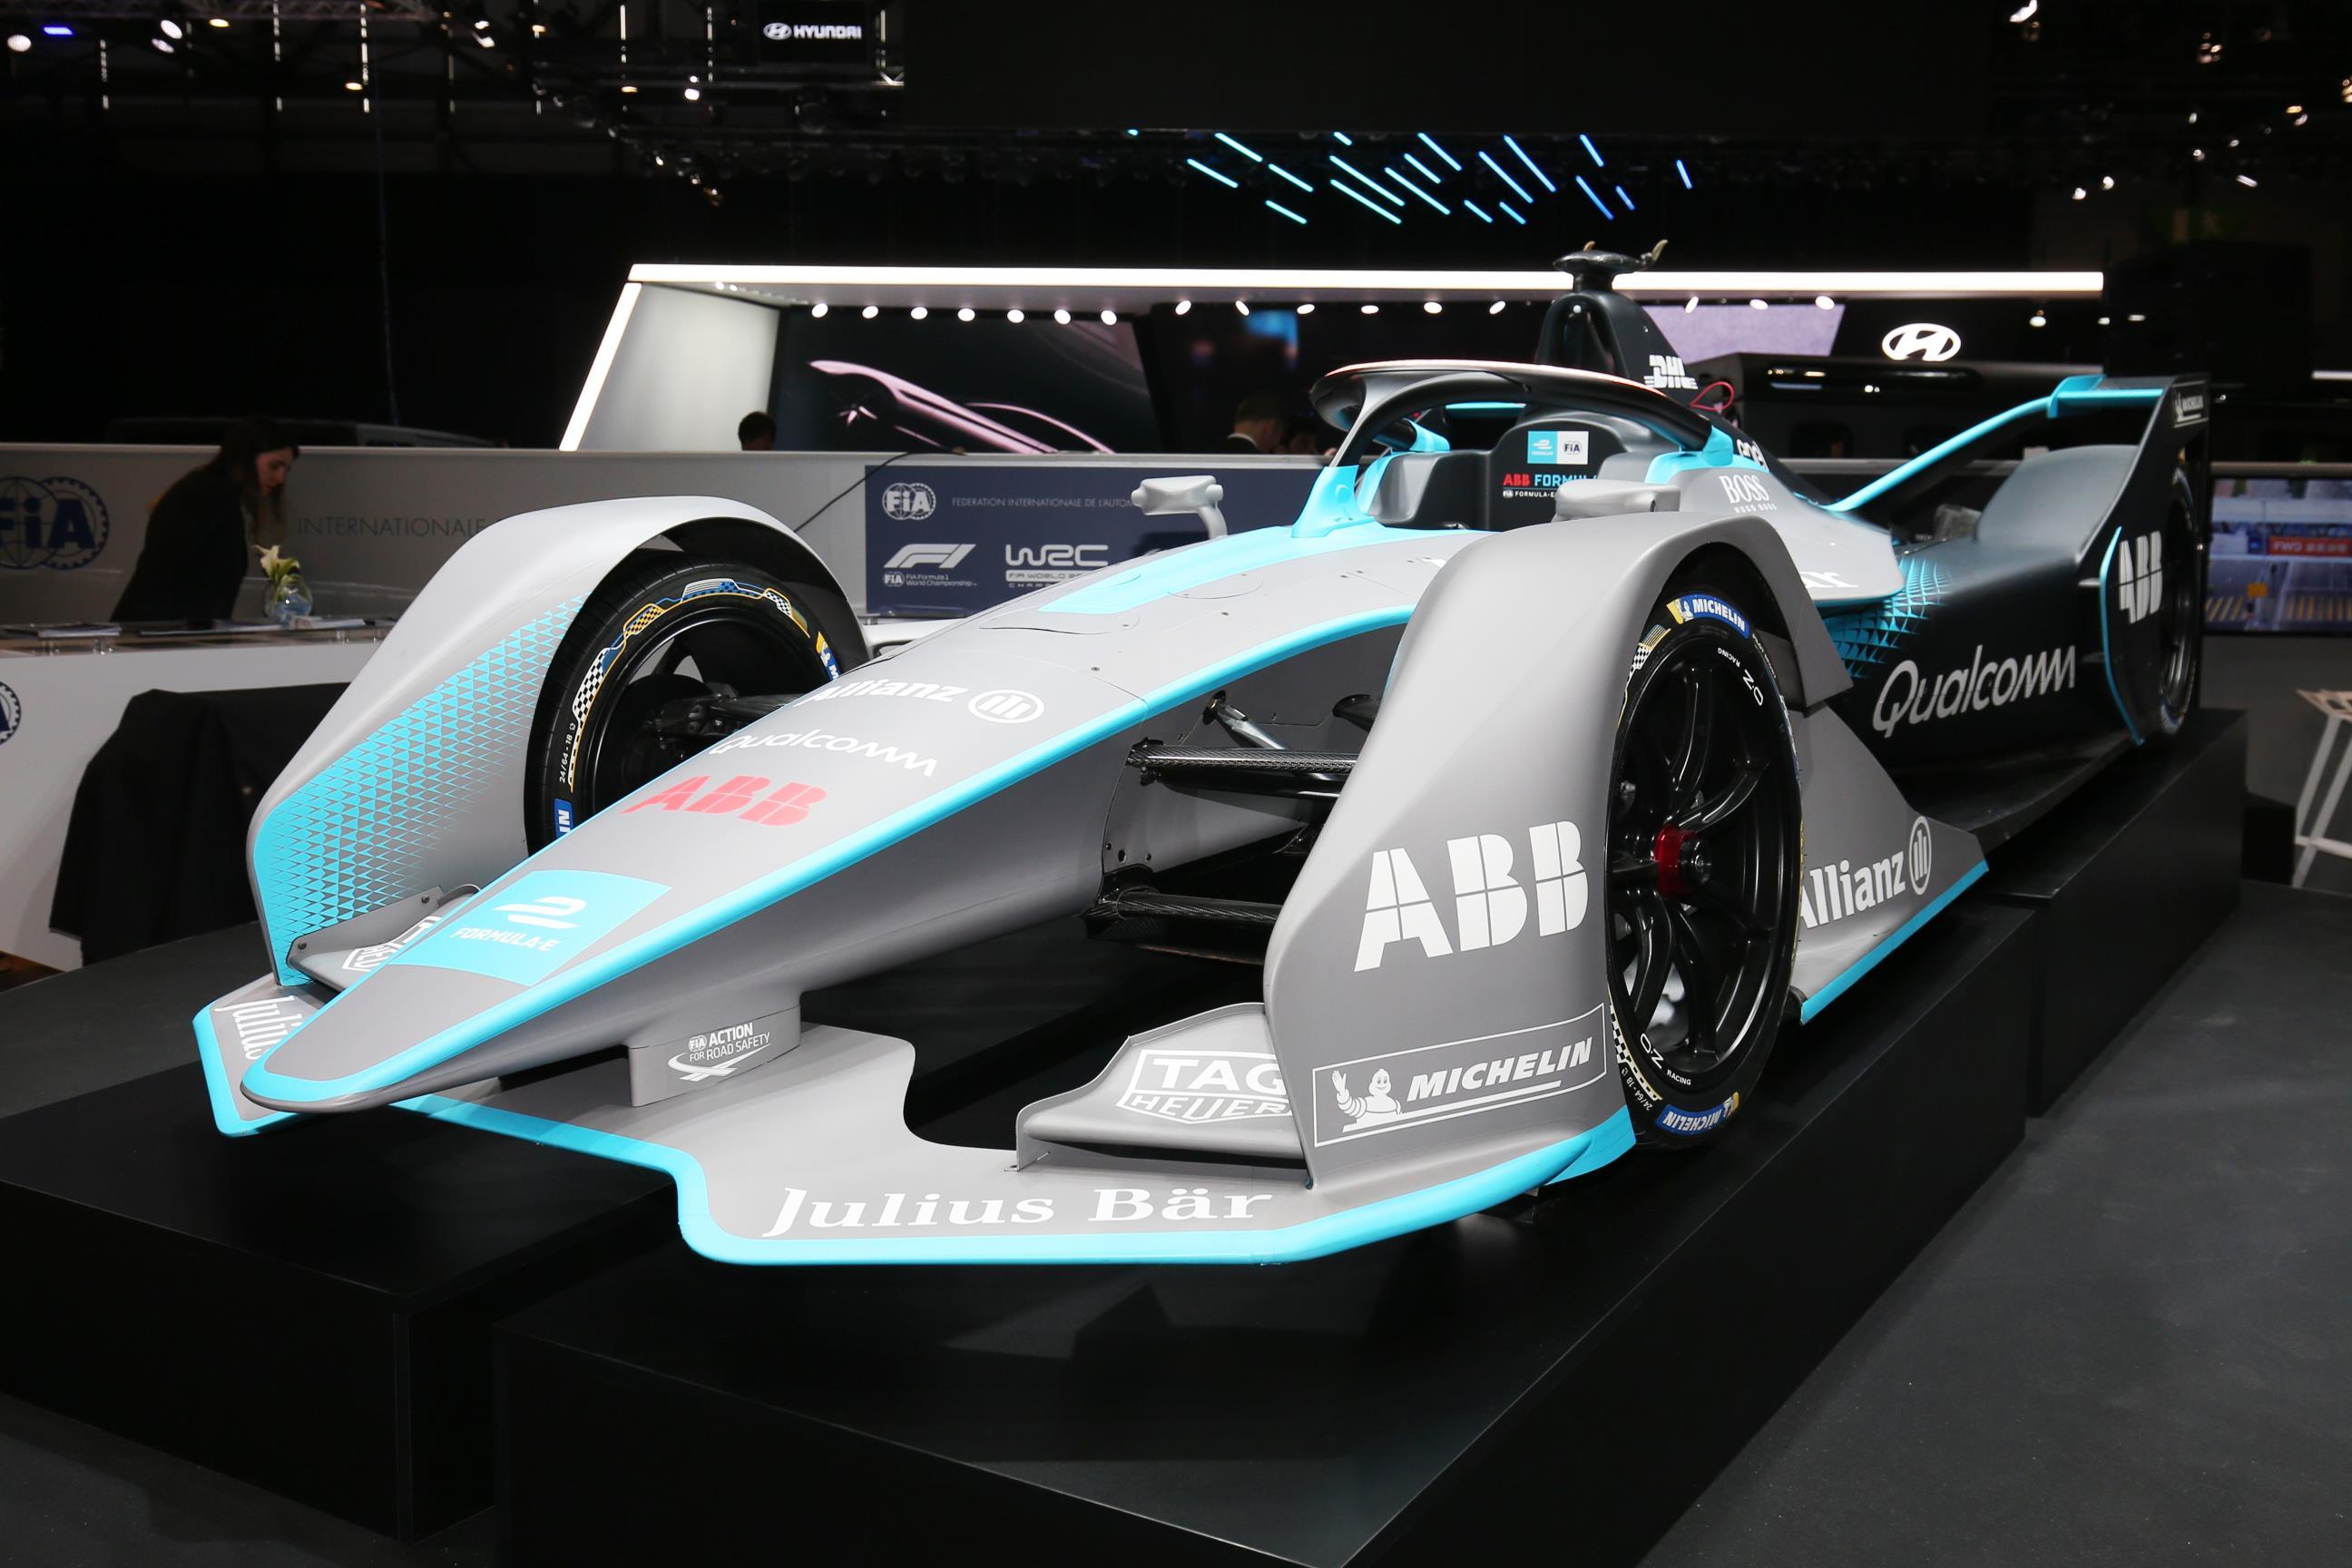 Geneva Motor Show 2018 Mega Gallery Part 1 (401)